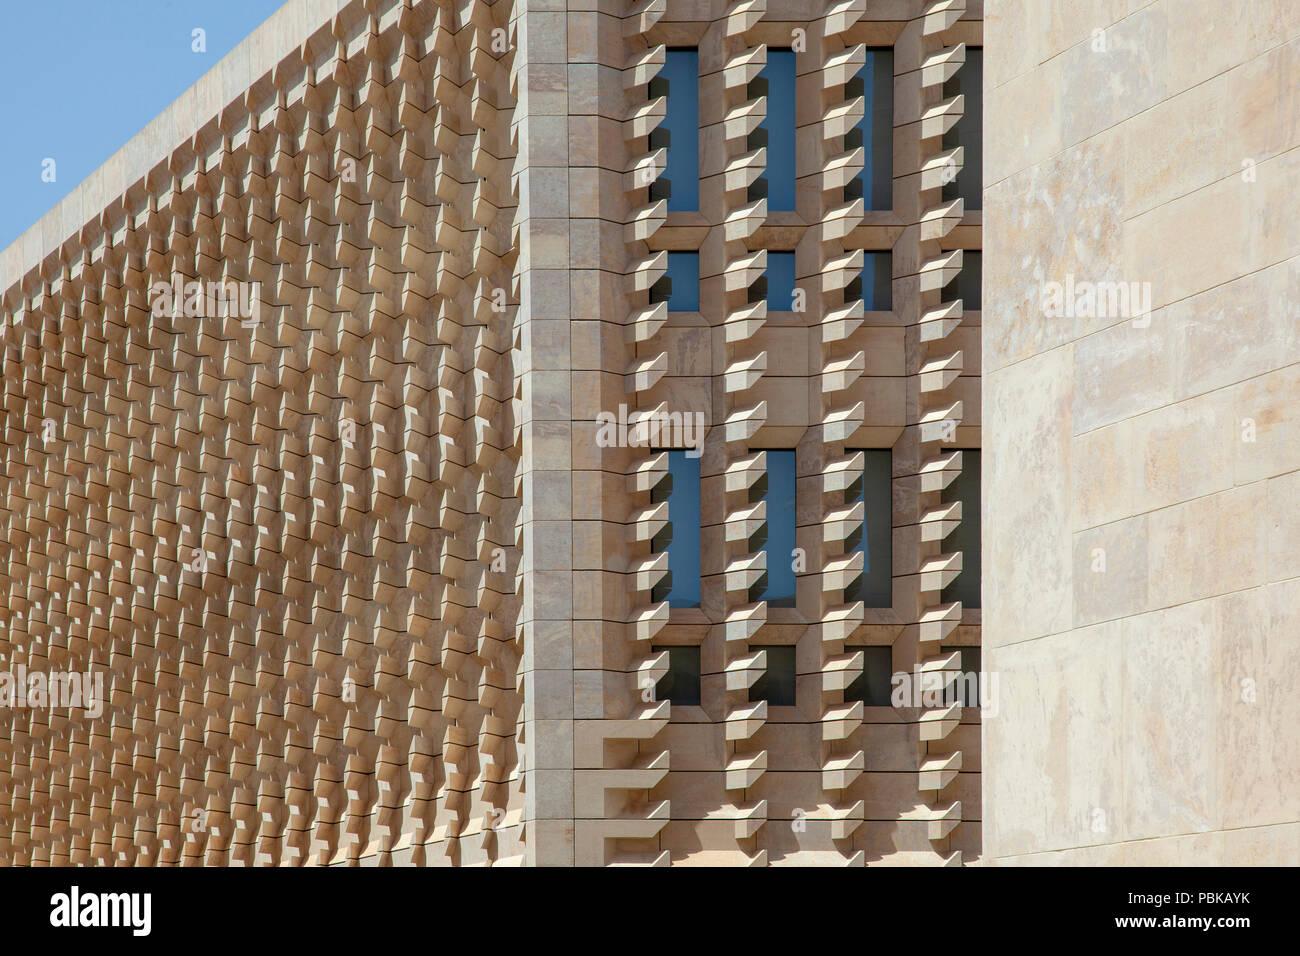 Gate of Valletta including New Parliament House, Valletta, Malta - Stock Image